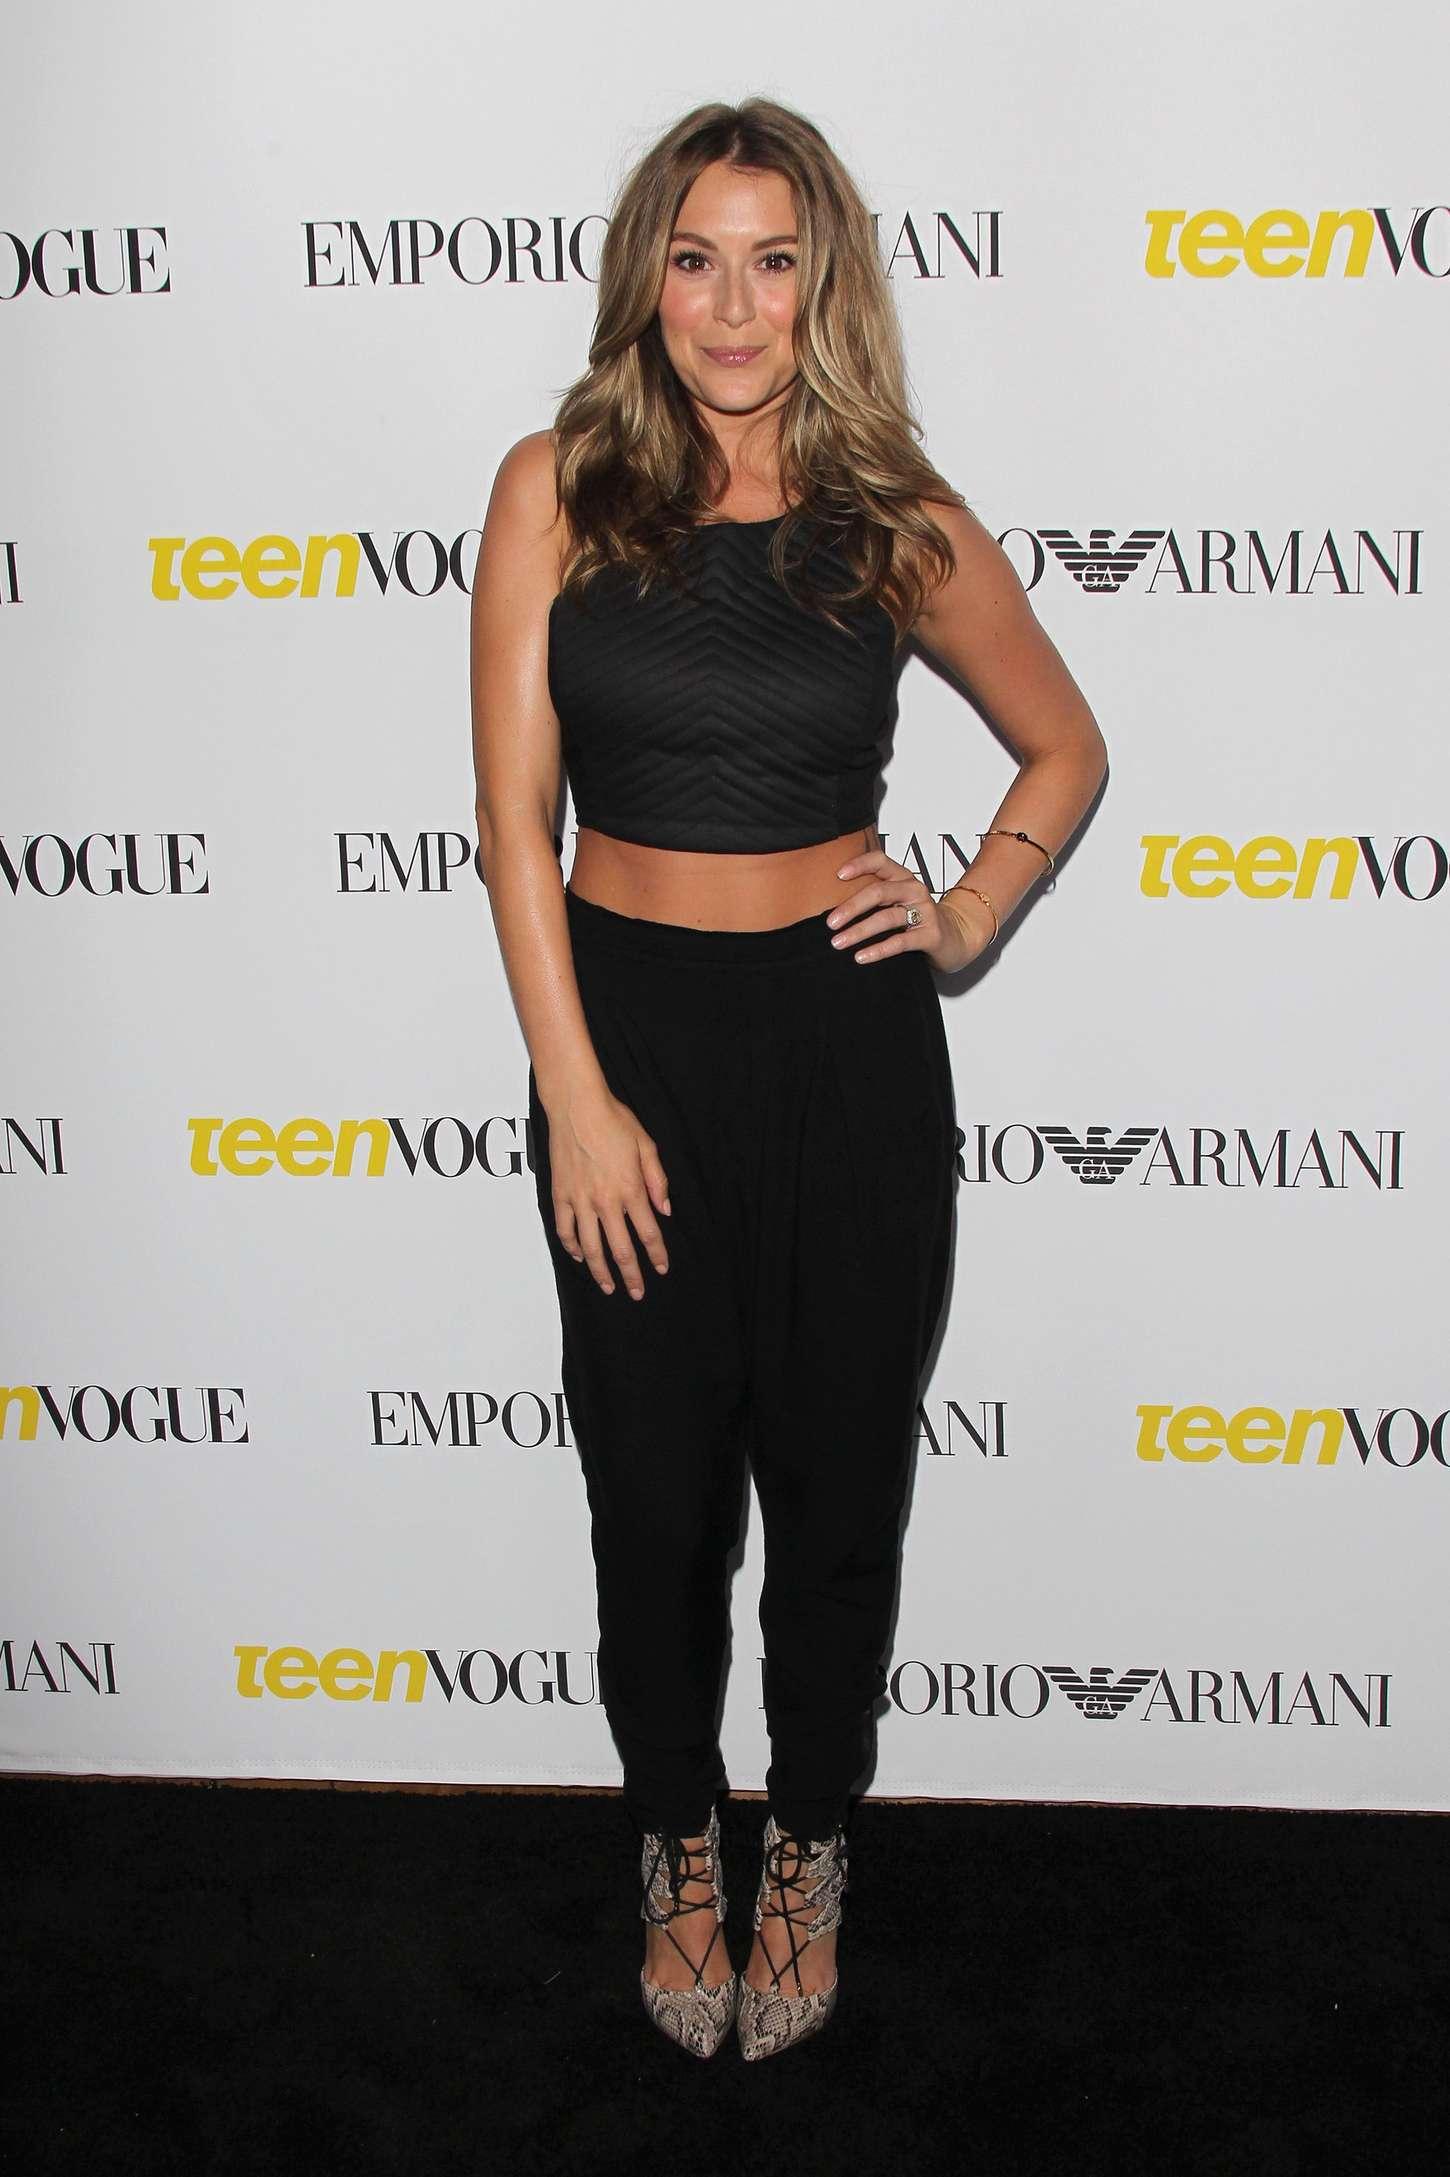 Alexa Vega 2015 : Alexa Vega: 2015 Teen Vogue Young Hollywood Party -06